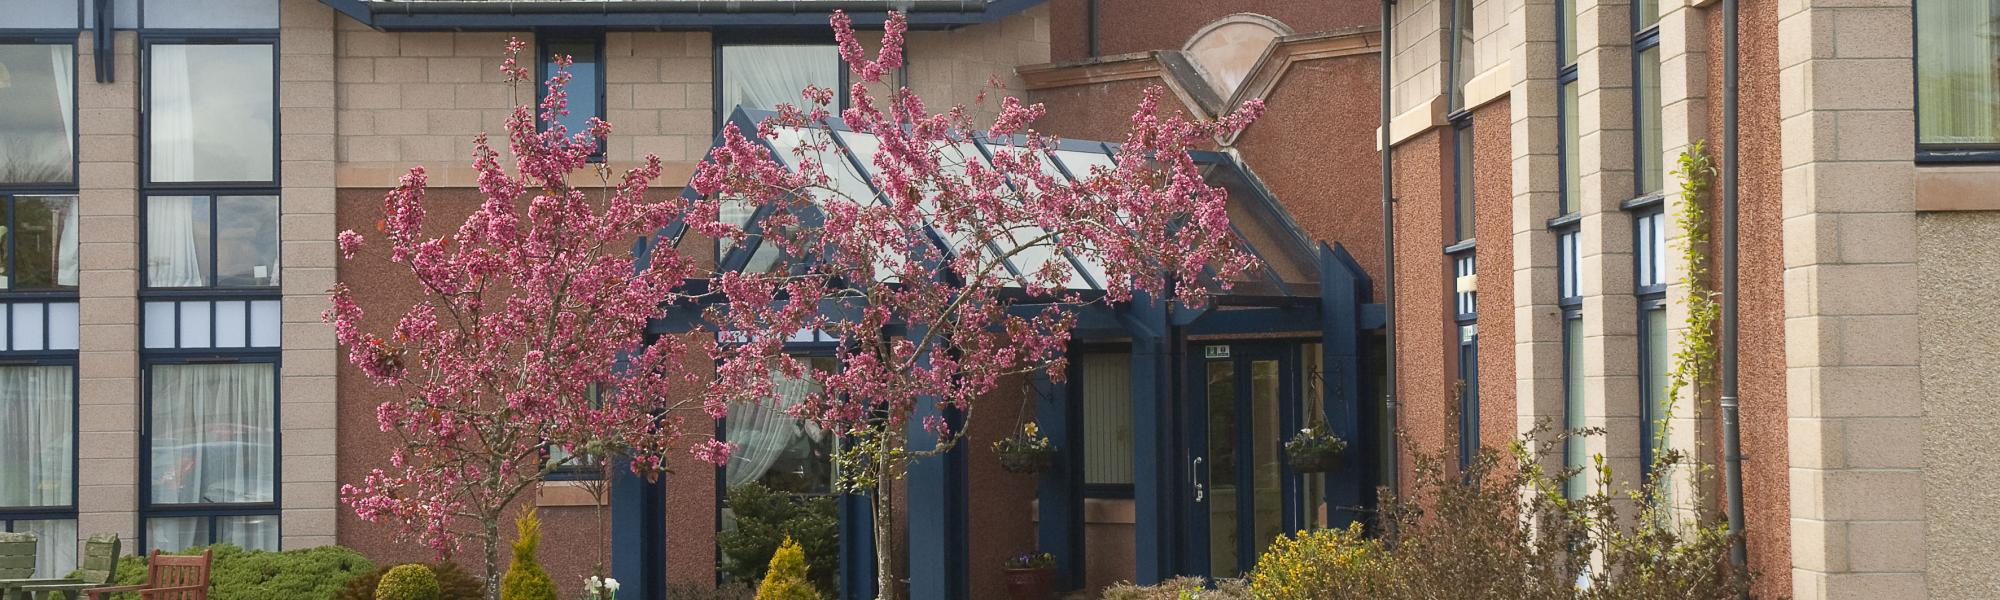 brighterkind Kingsmills Care Home in Inverness